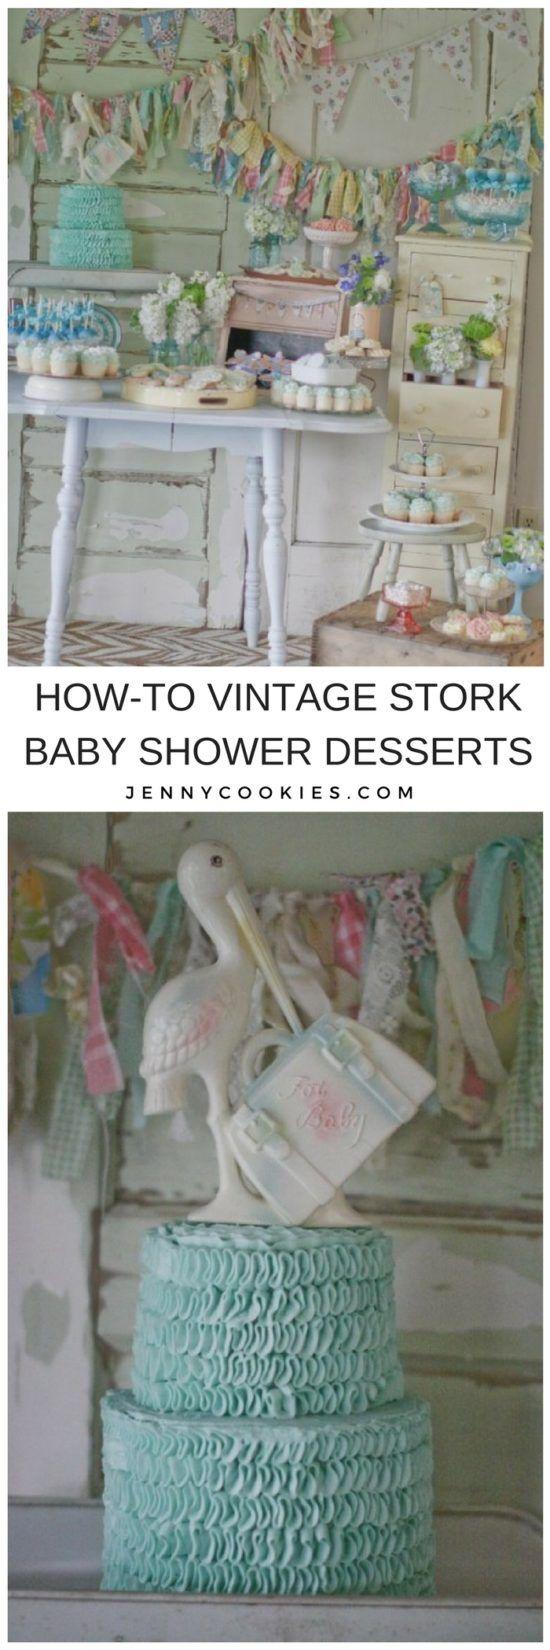 Best 25+ Stork baby showers ideas on Pinterest | Baby ...